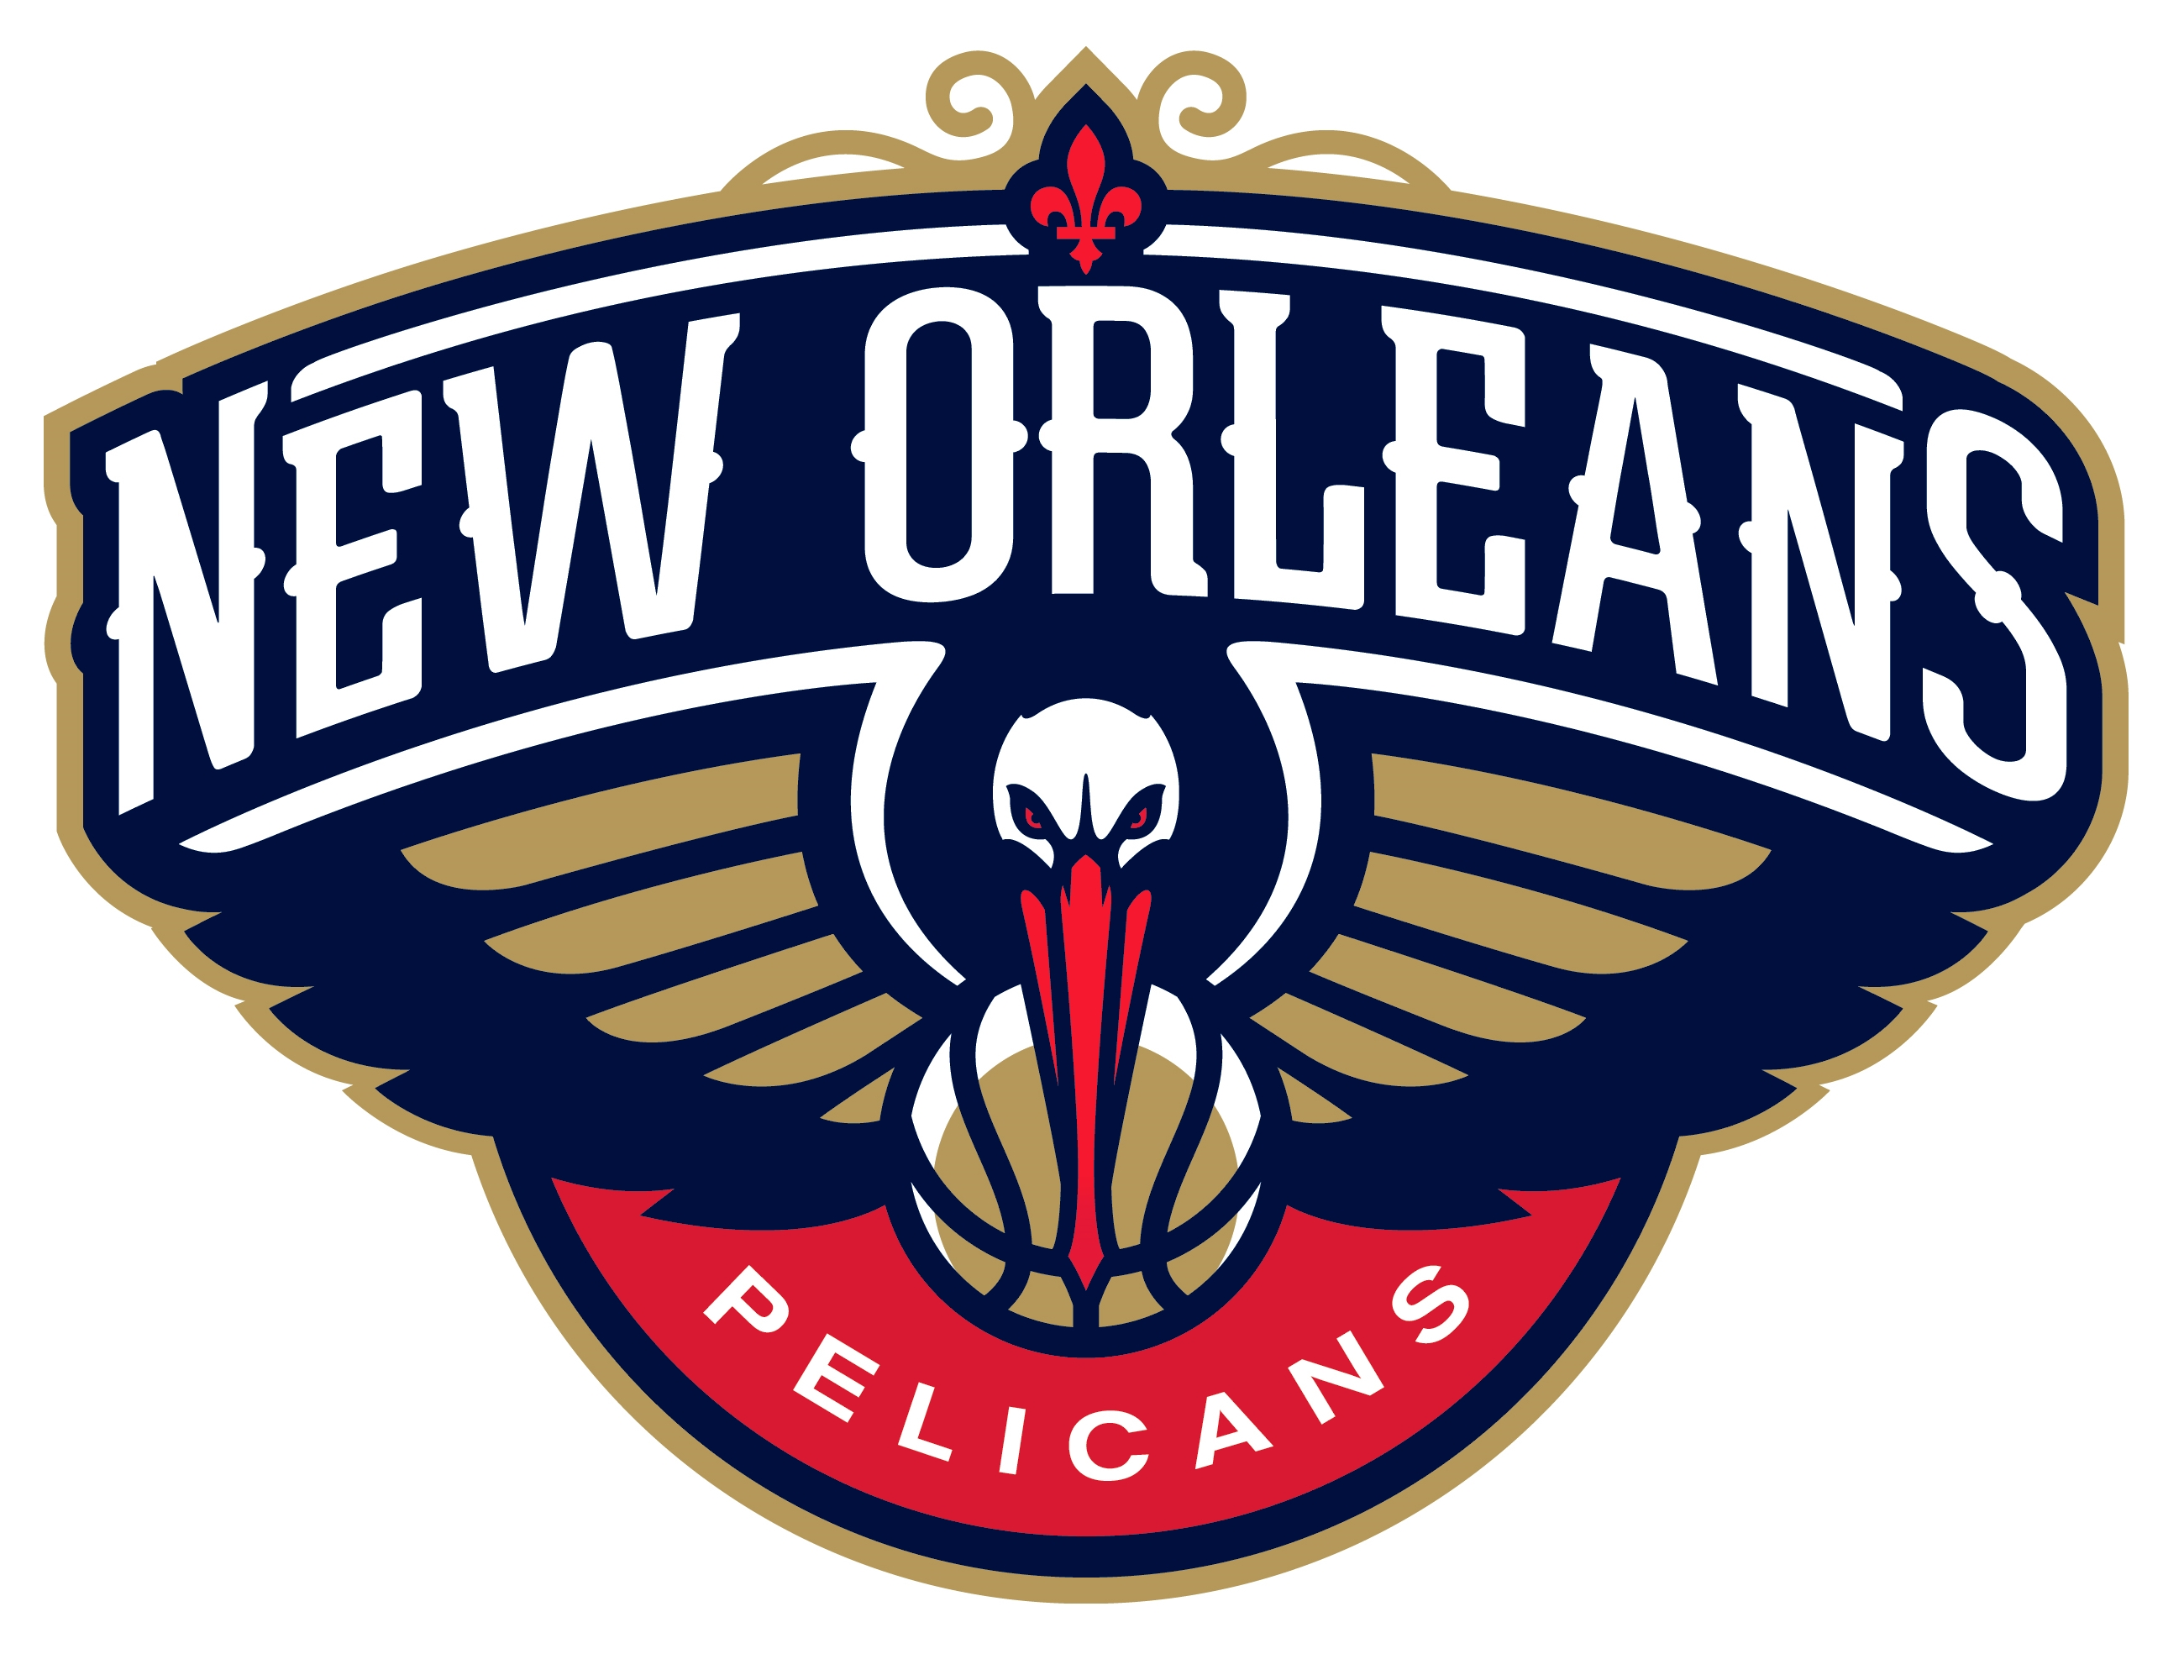 New Orleans Pelicans logo, logotype, emblem